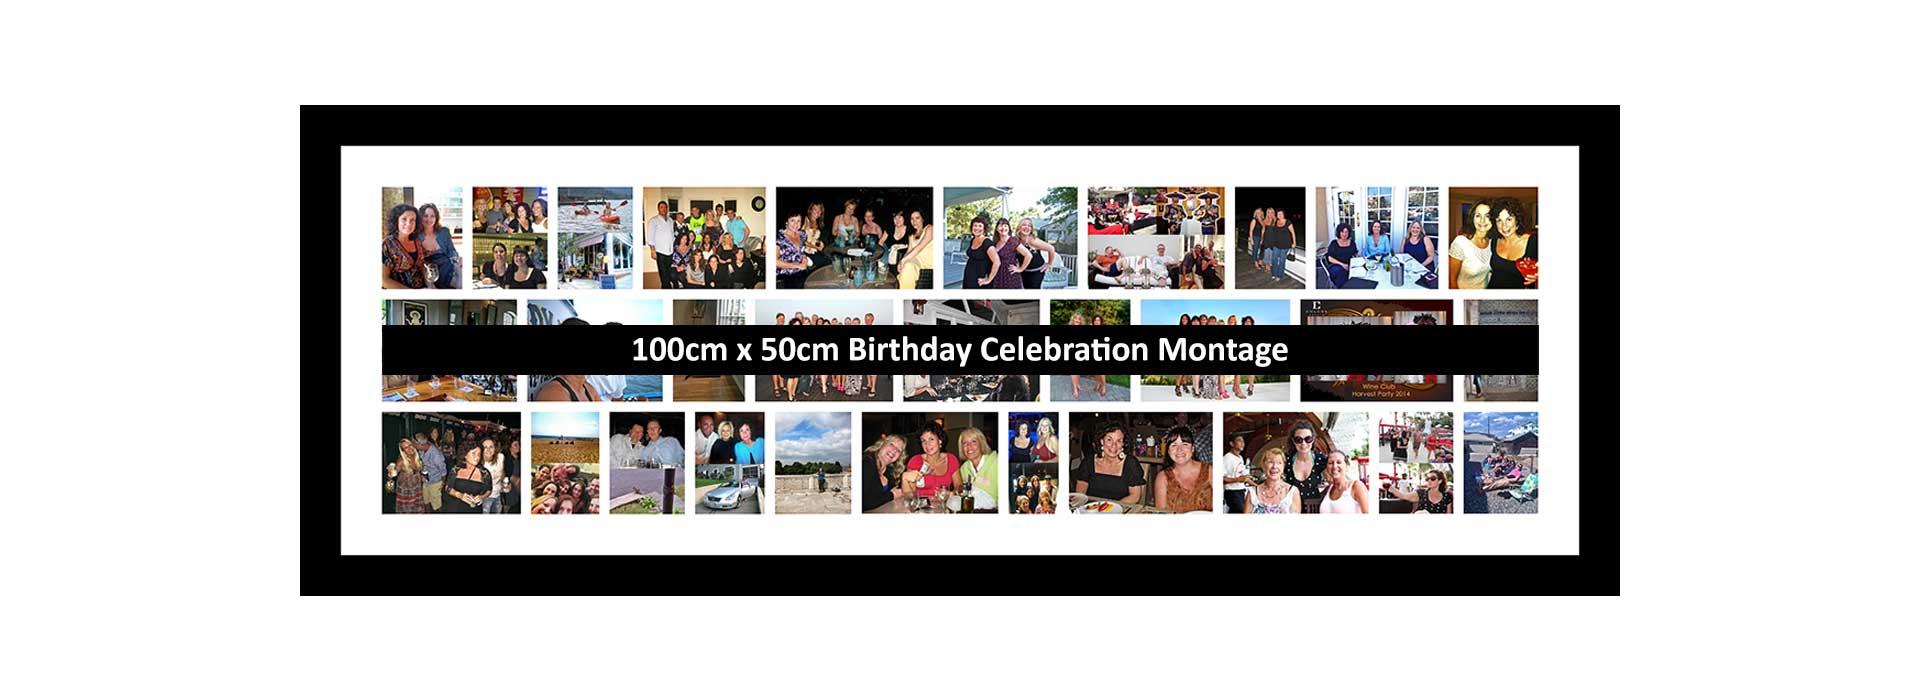 Birthday Montage